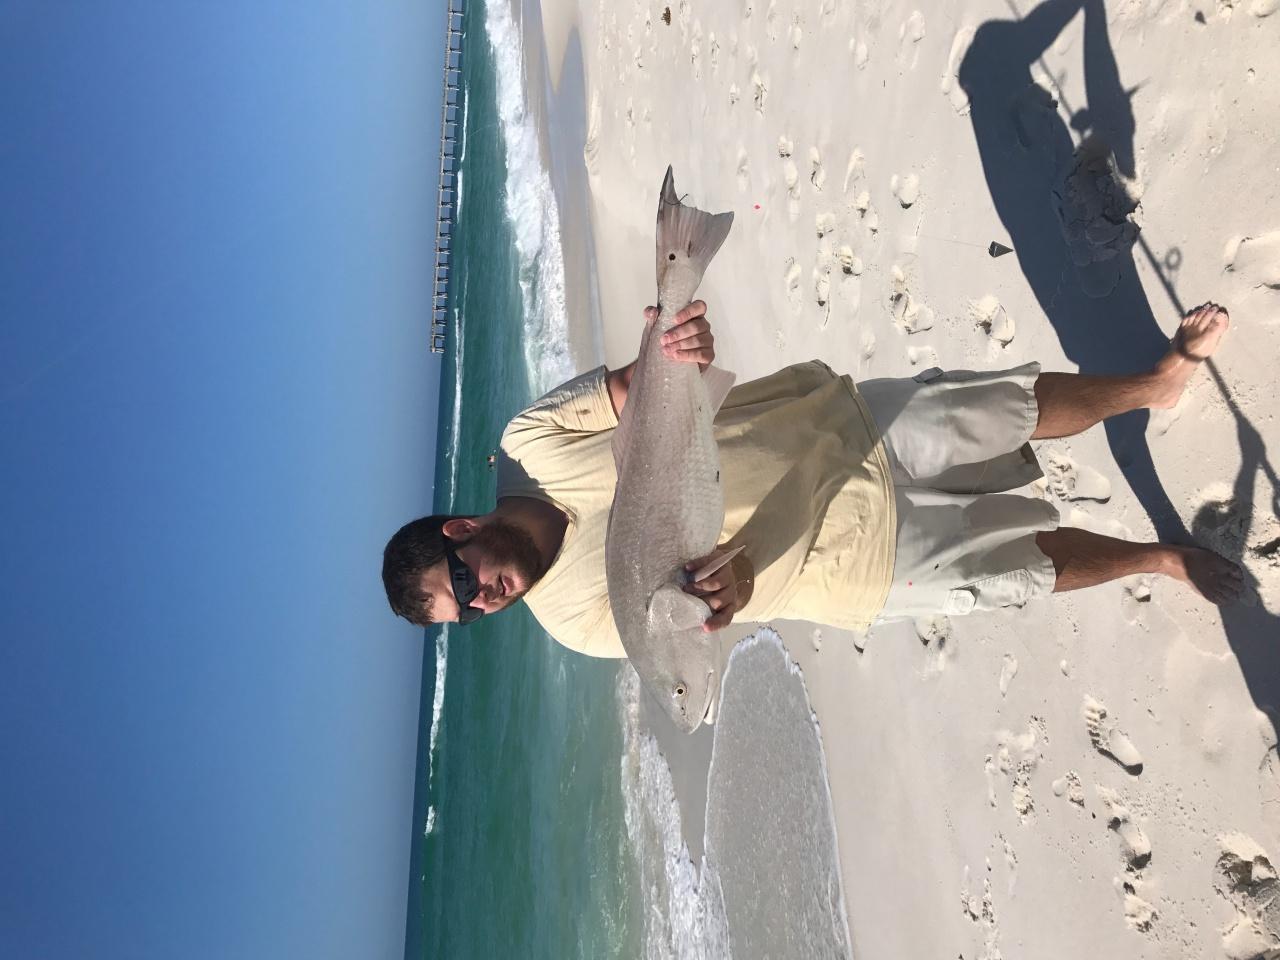 Redfish off Navarre-mxxs2379-jpg